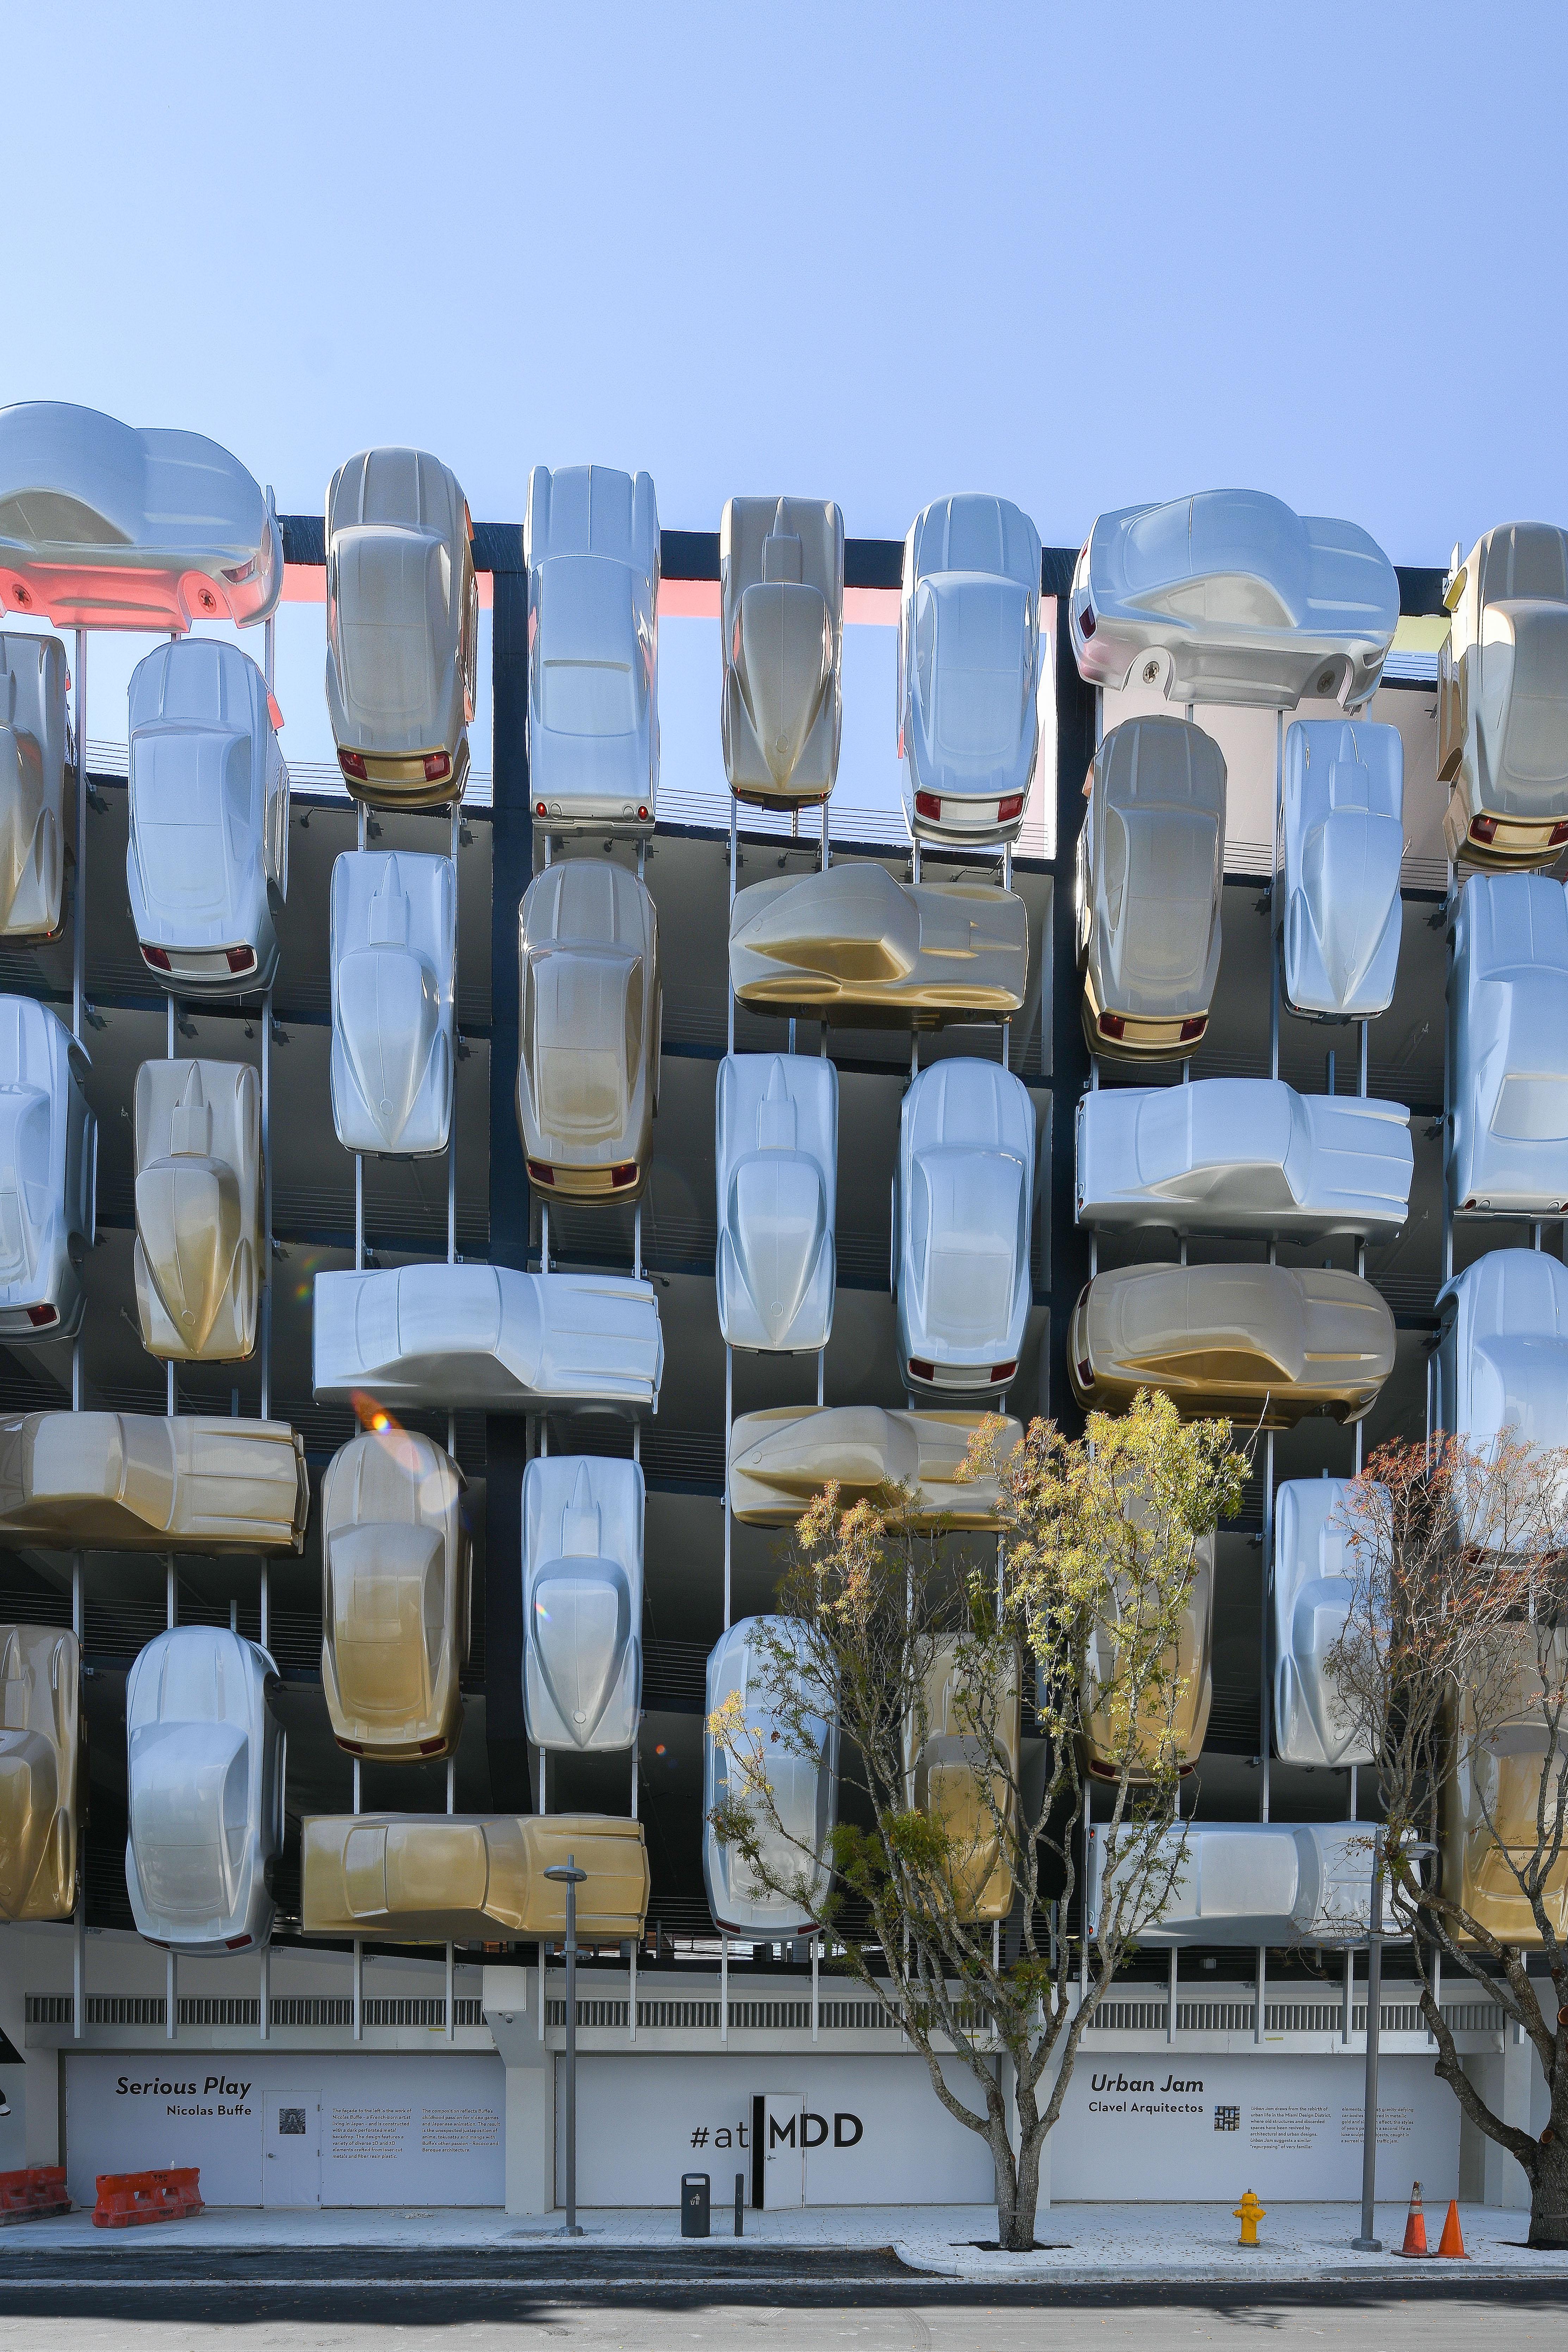 Urban Jam by Clavel Arquitectos.